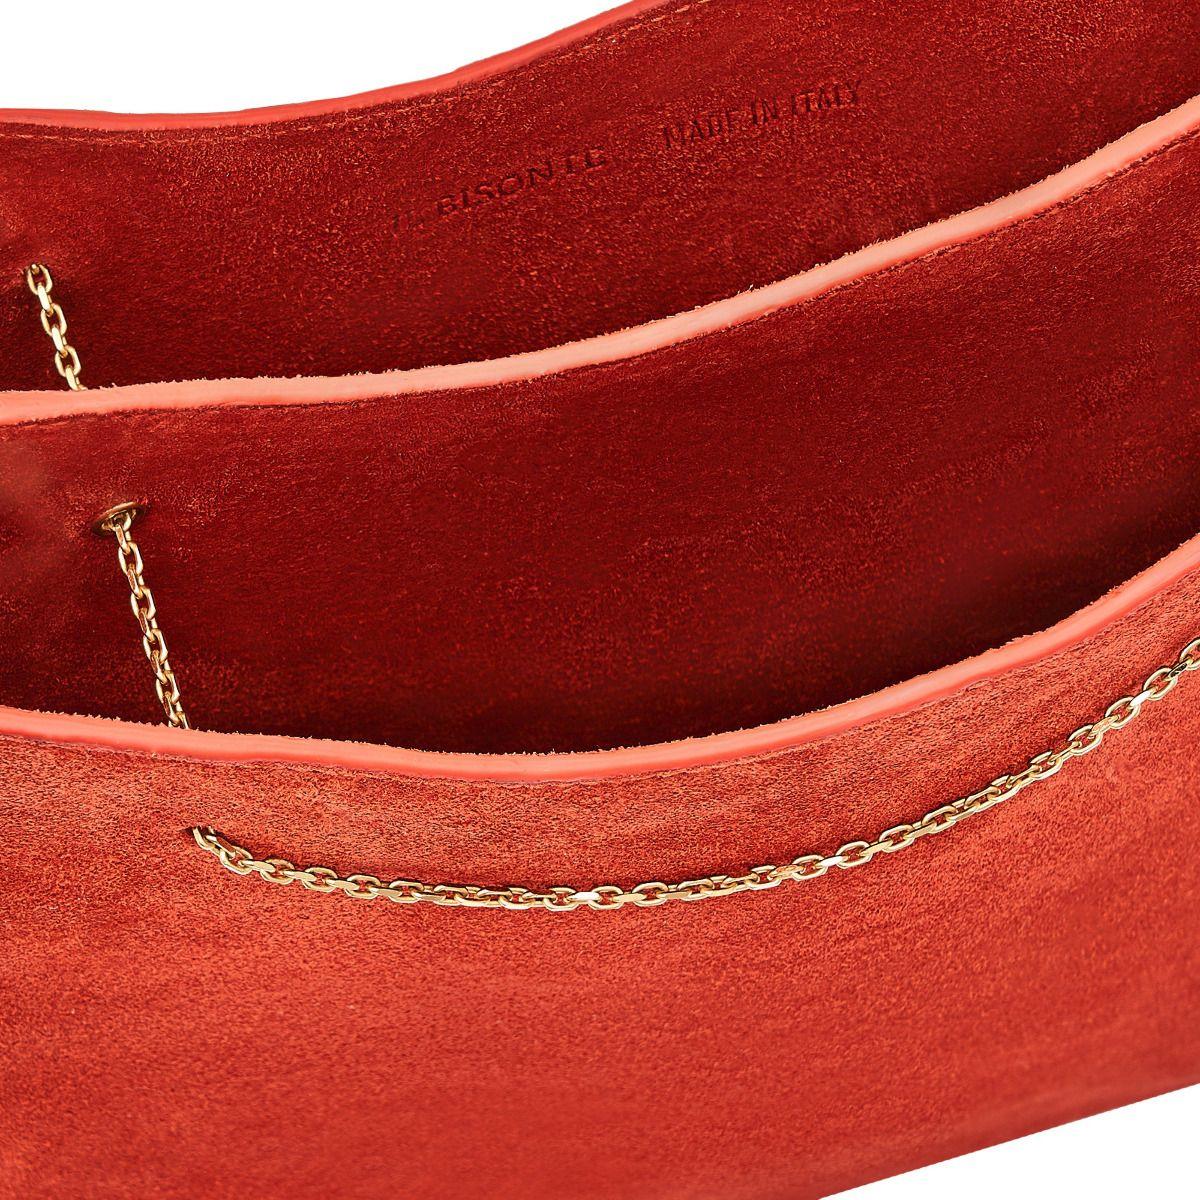 Giglio - Women's Shoulder Bag in Re-Suede color Pink - Mediterranea line BSH132 | Details